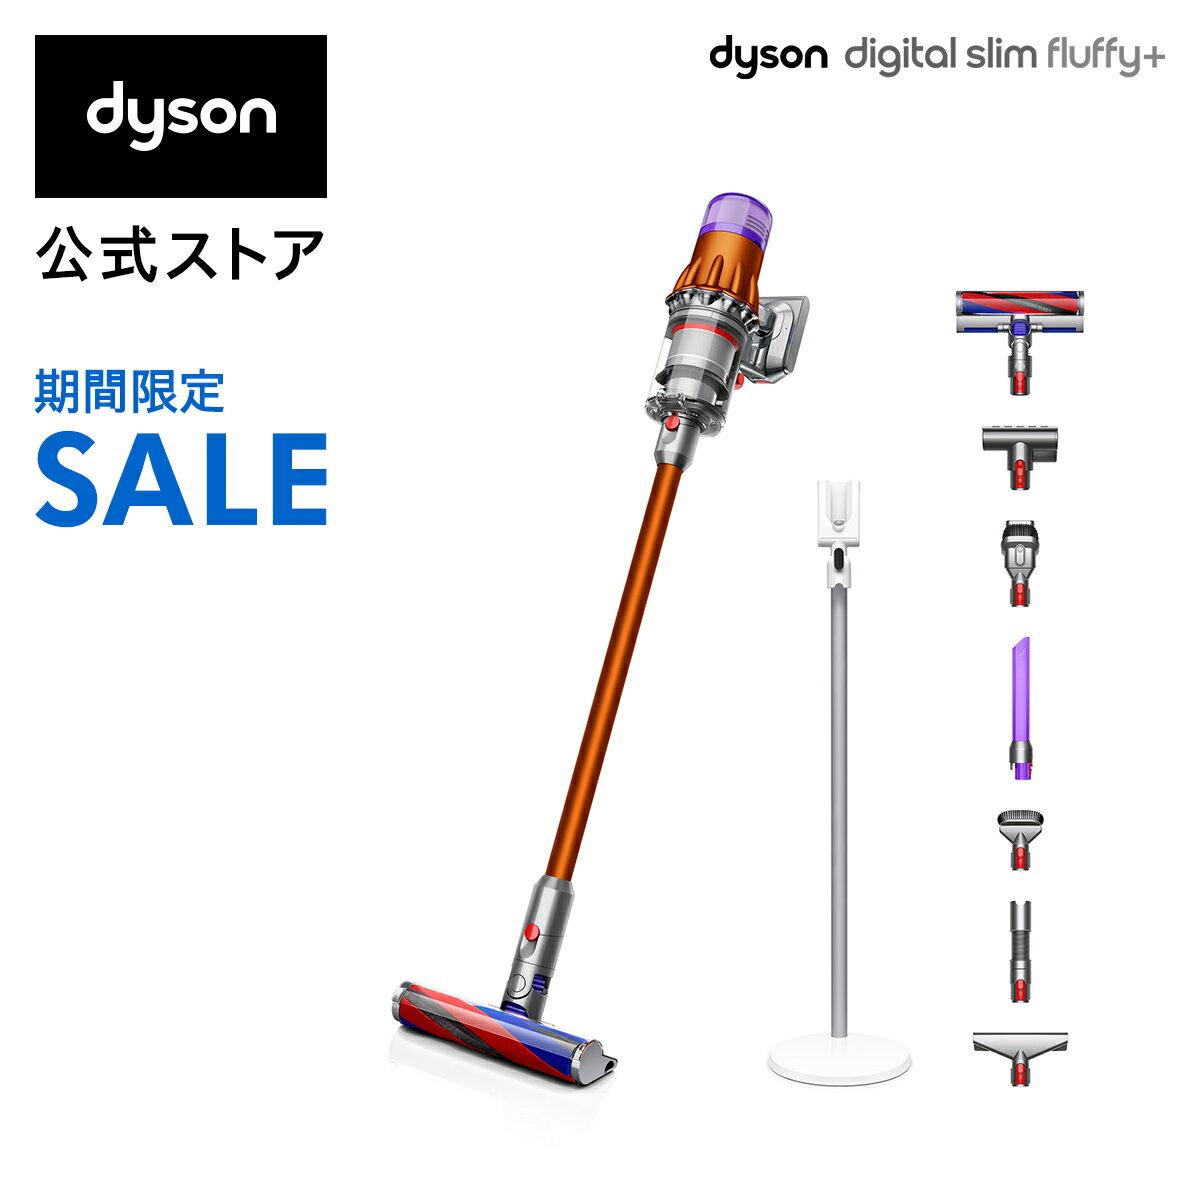 15%OFF【期間限定価格】【ポイント5倍】27日23:59まで!【軽量でパワフル】ダイソン Dyson Digital Slim Fluffy+ サイクロン式 コードレス掃除機 dyson SV18FFCOM 2020年モデル